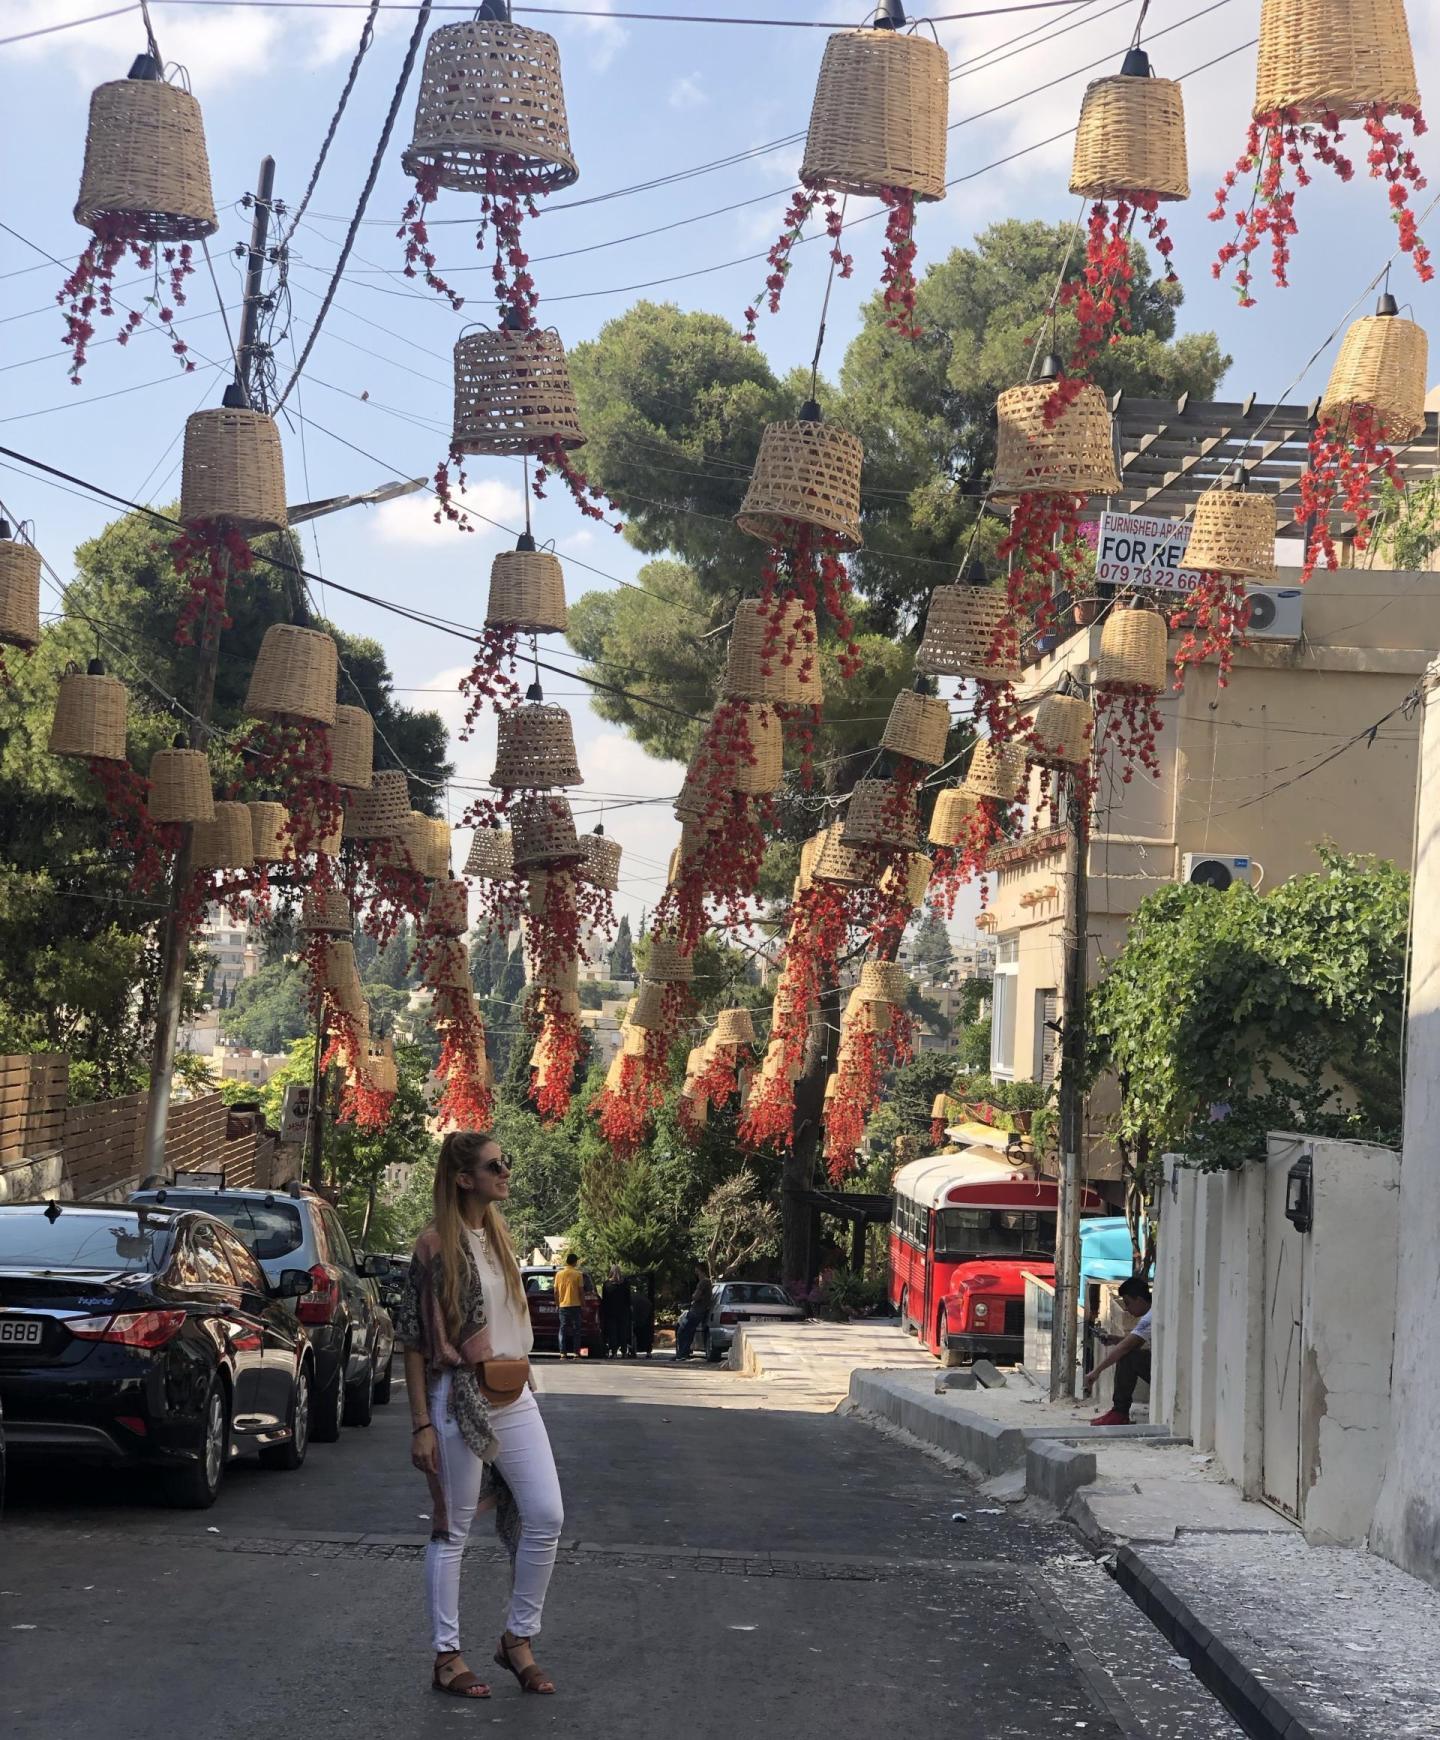 Woman walking the streets of Jordan.